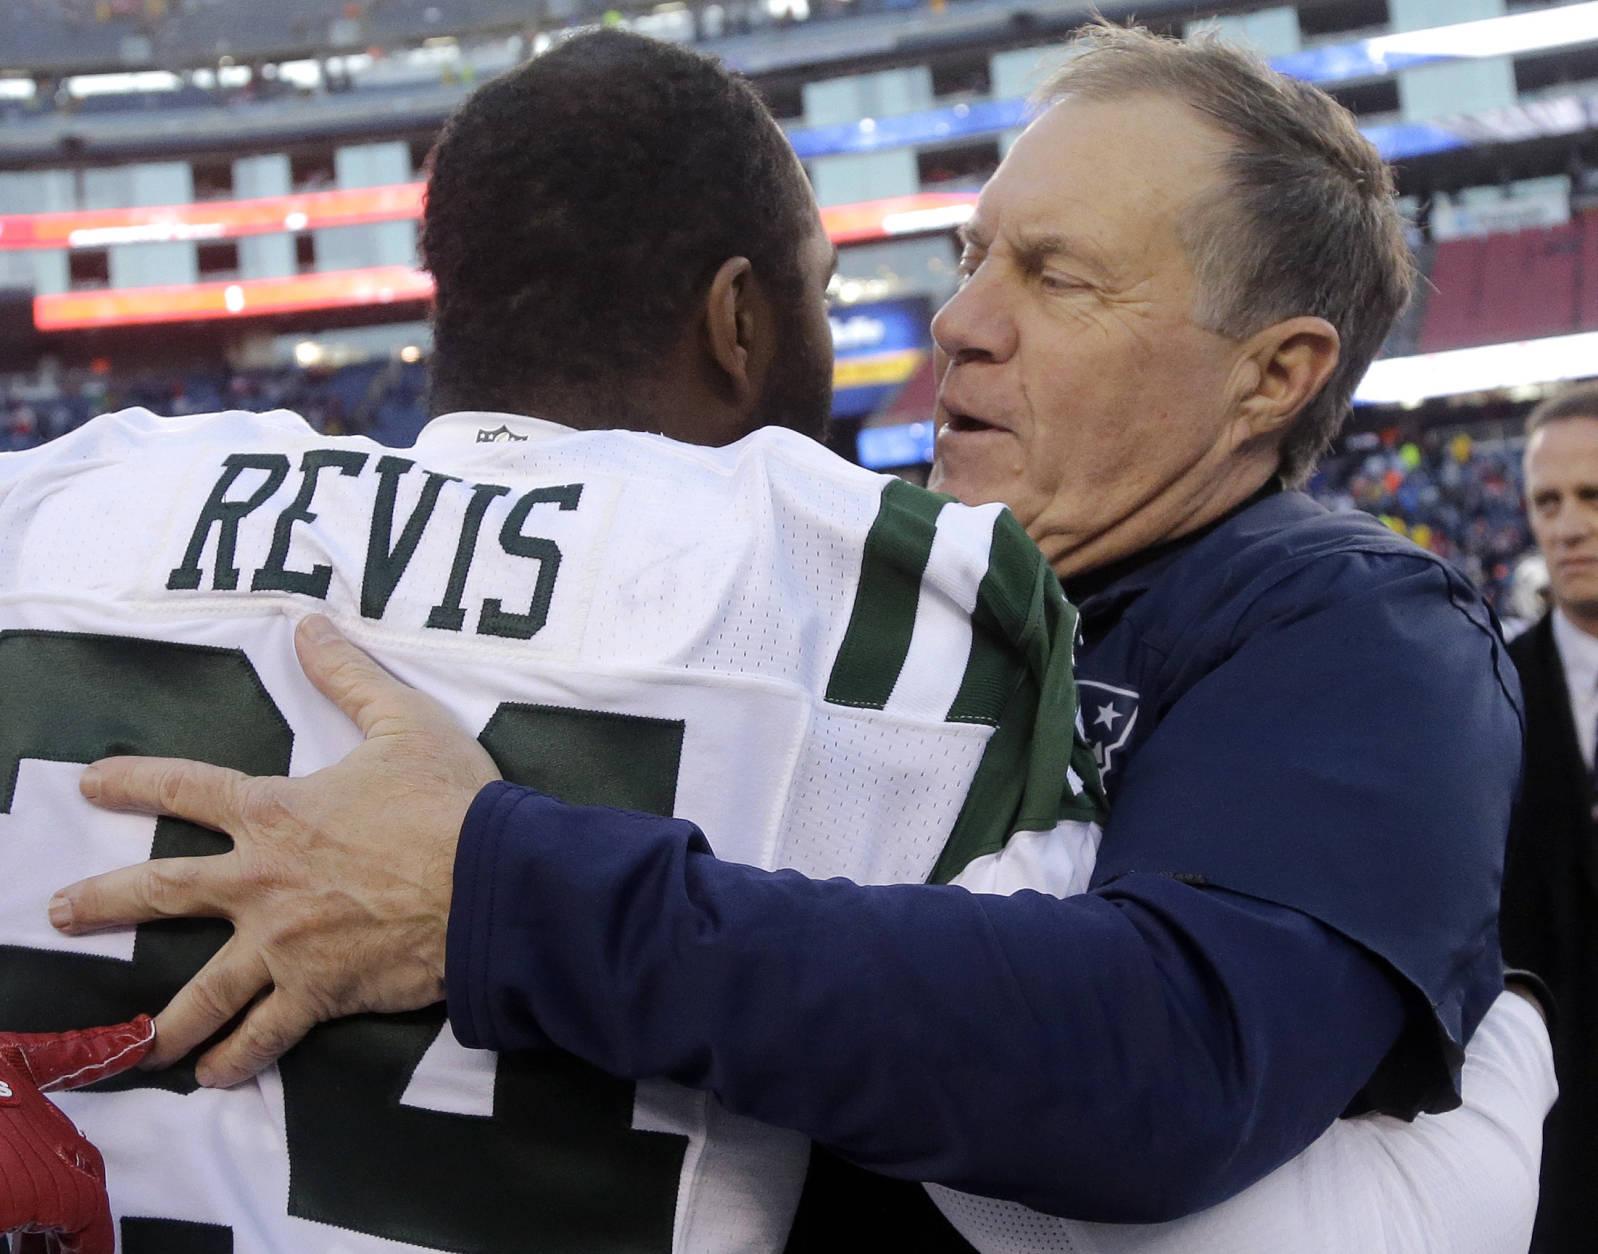 New England Patriots head coach Bill Belichick, right, and New York Jets cornerback Darrelle Revis speak at midfield following an NFL football game, Saturday, Dec. 24, 2016, in Foxborough, Mass. (AP Photo/Elise Amendola)